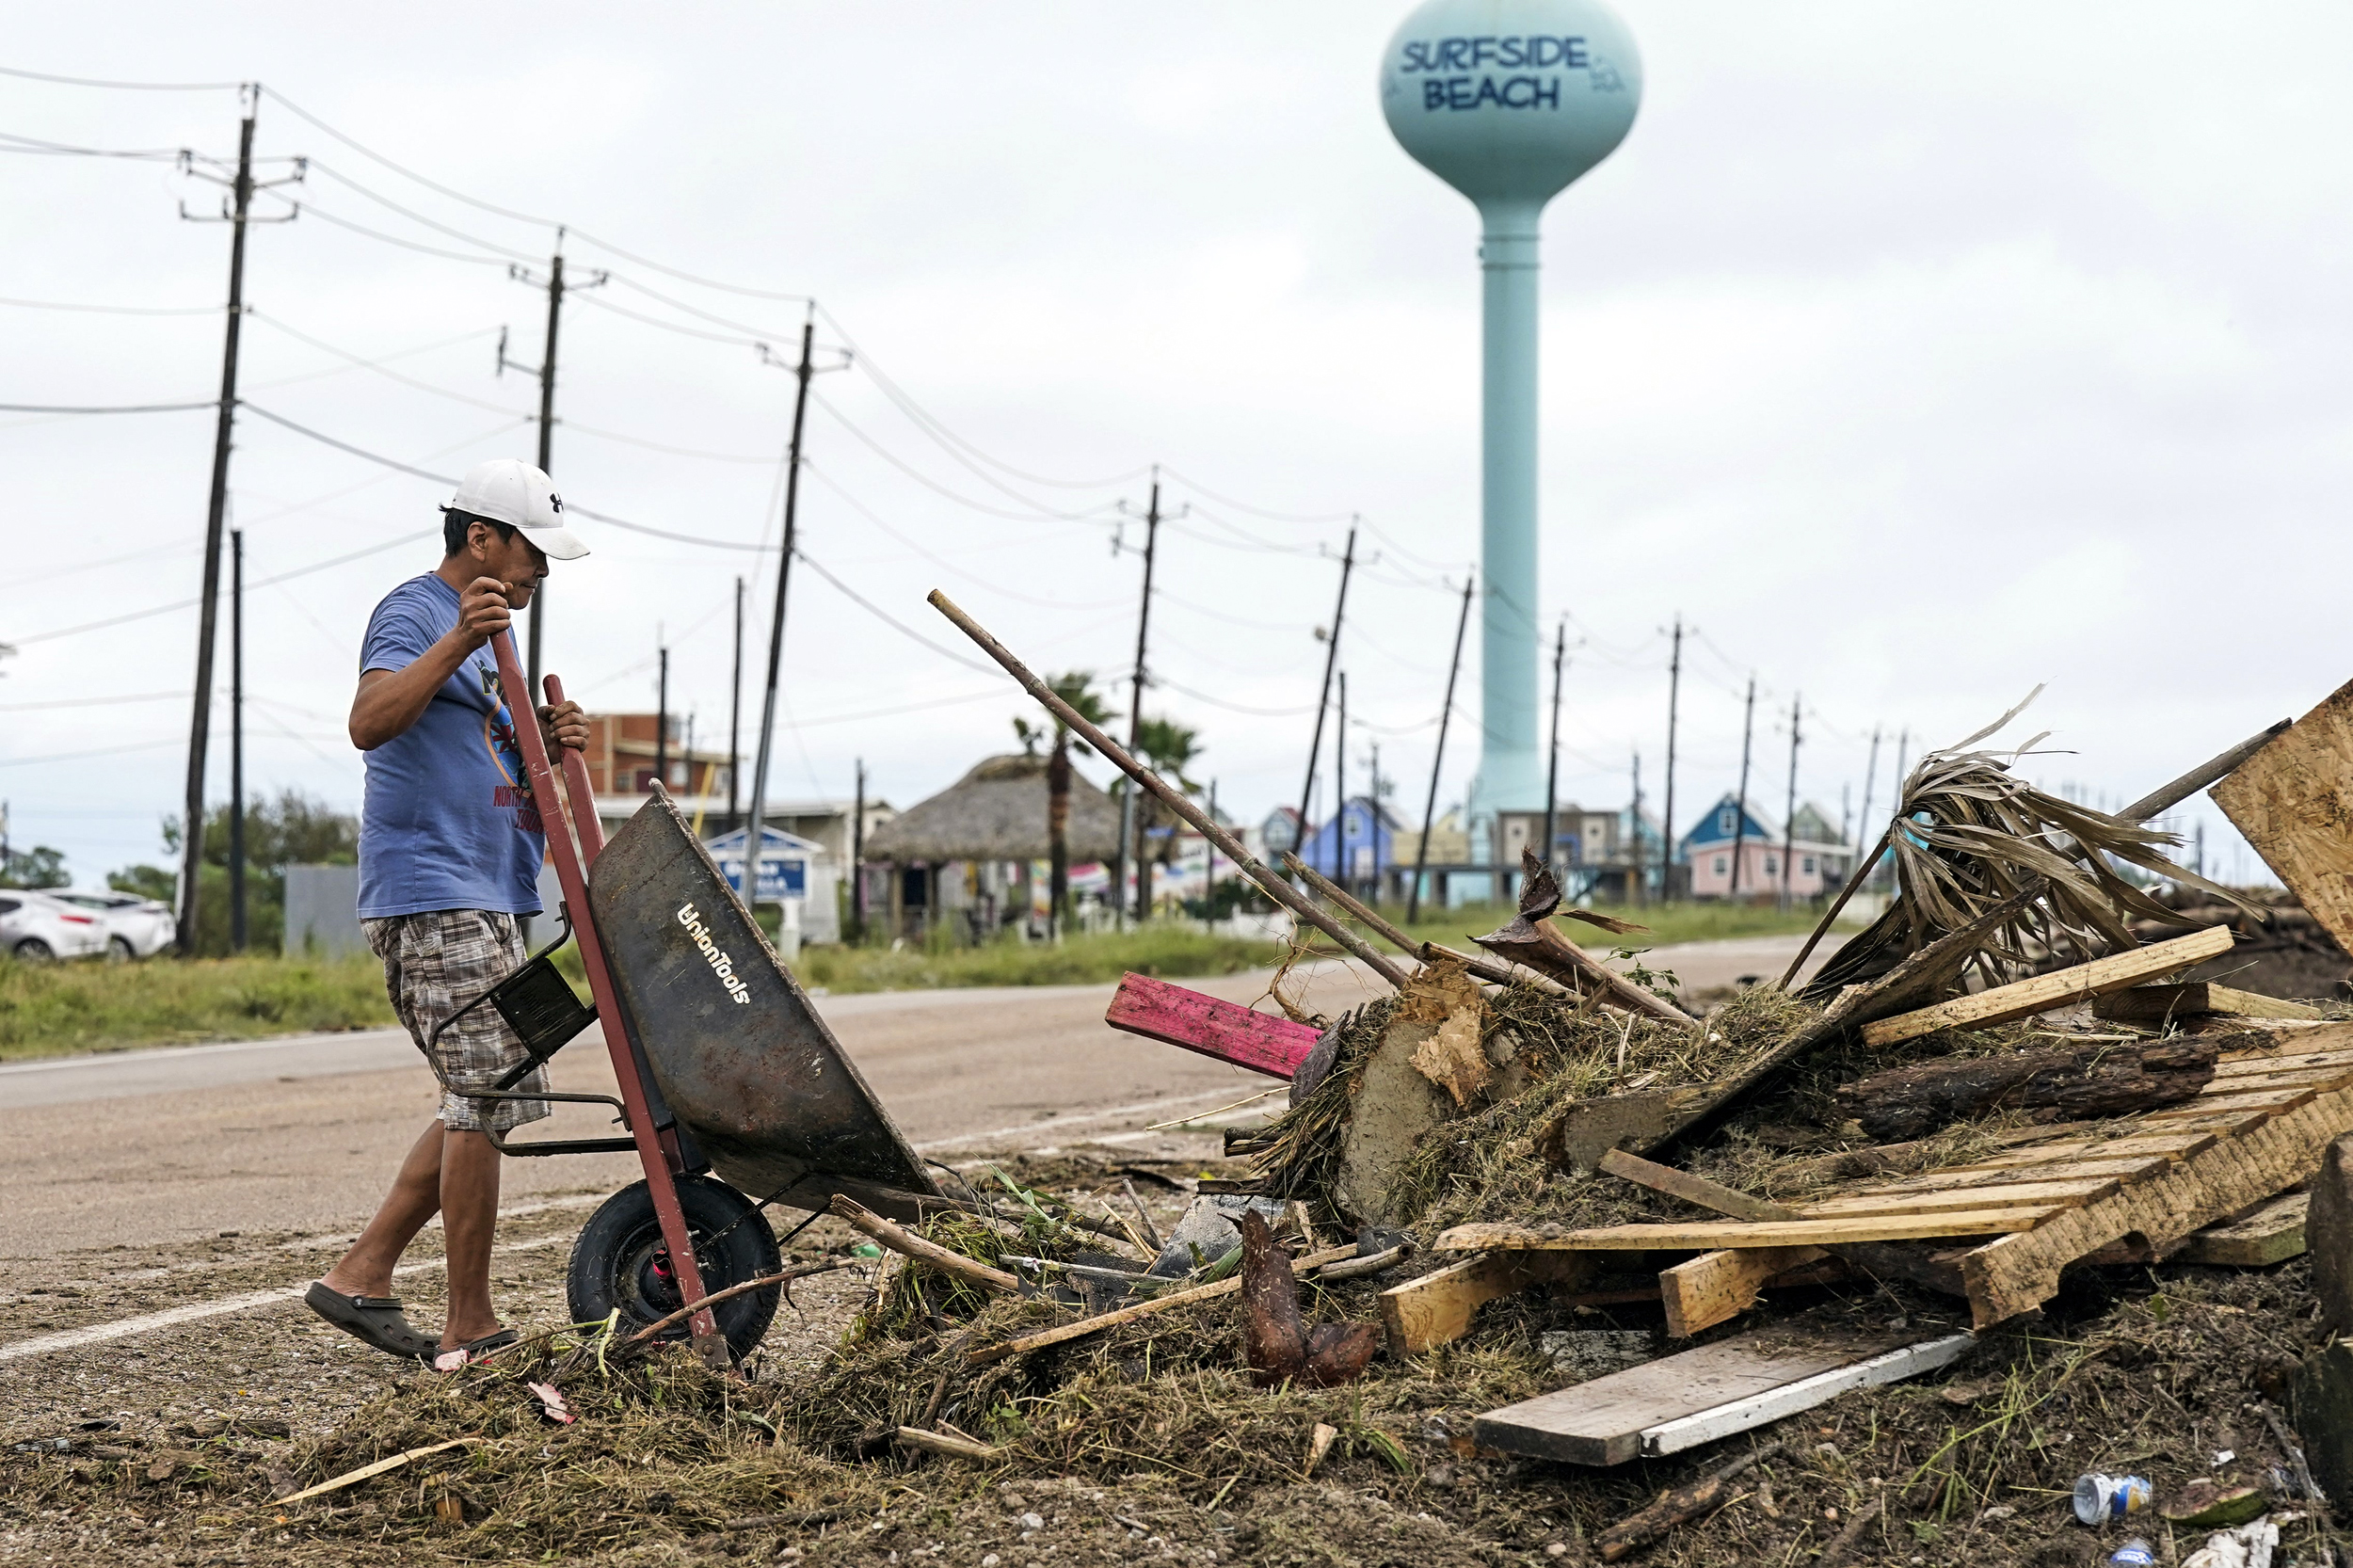 250,000 without power as Nicholas soaks Texas and Louisiana